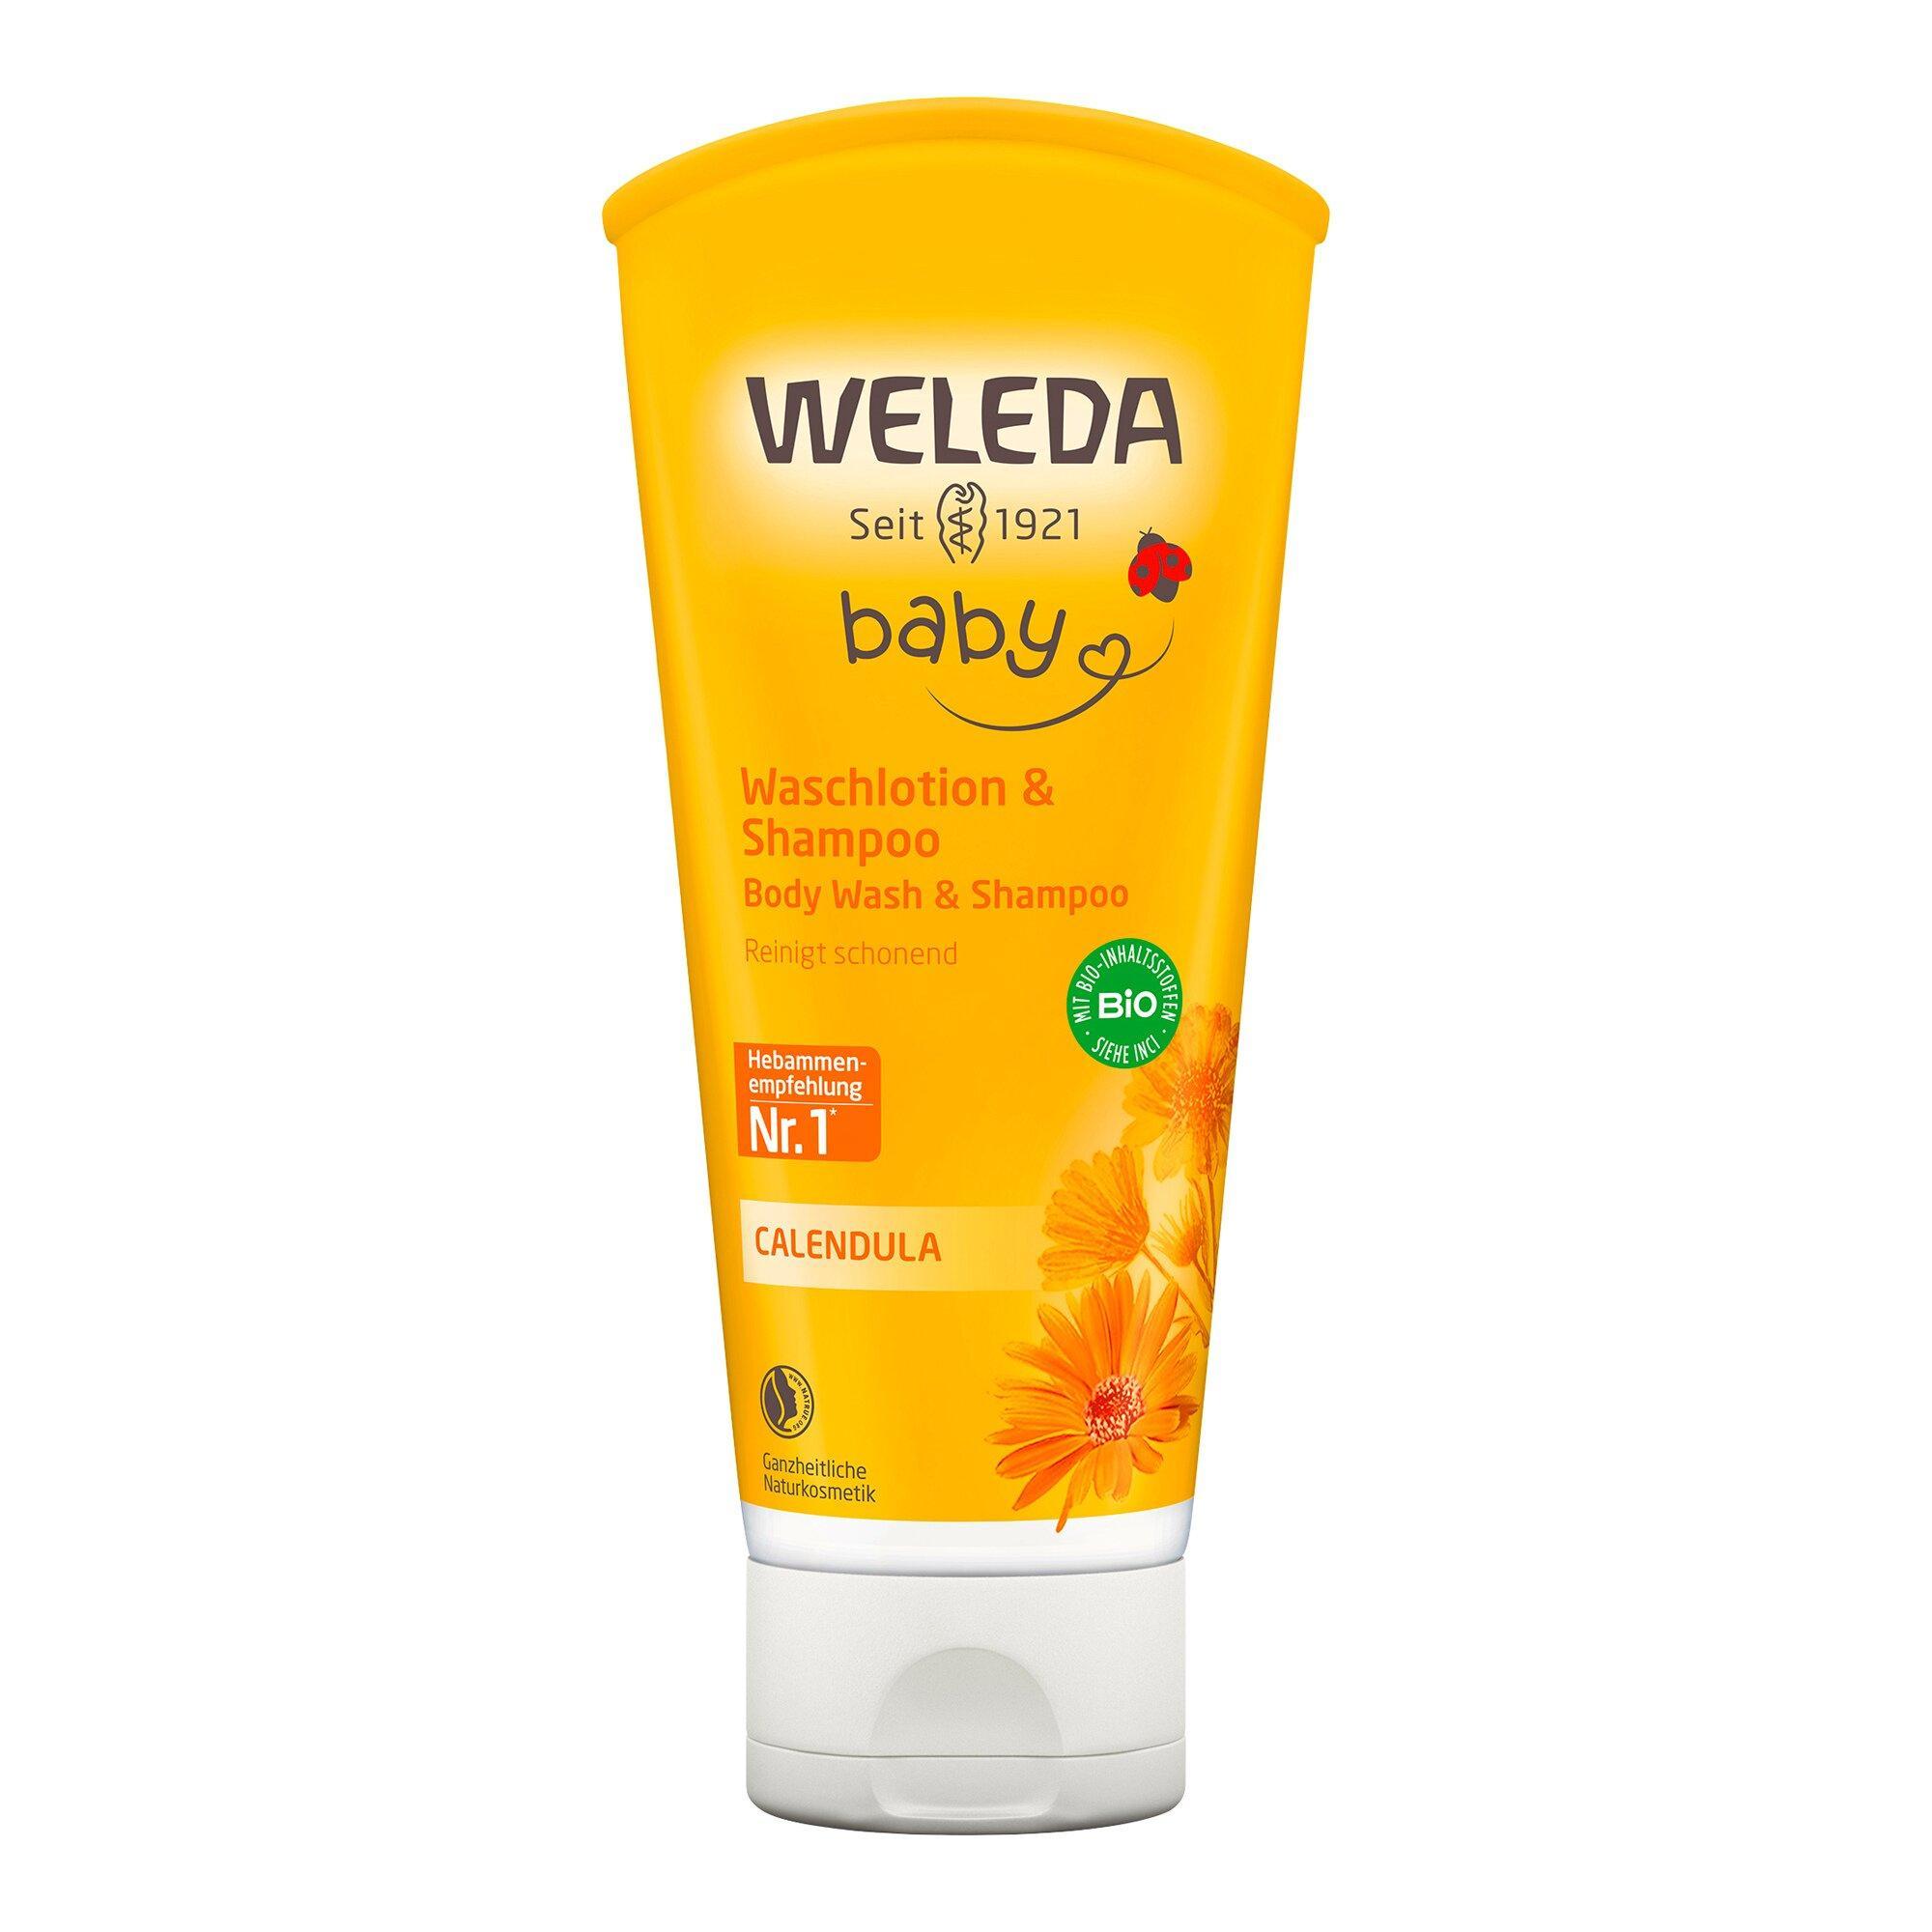 Calendula Waschlotion & Shampoo 200 ml